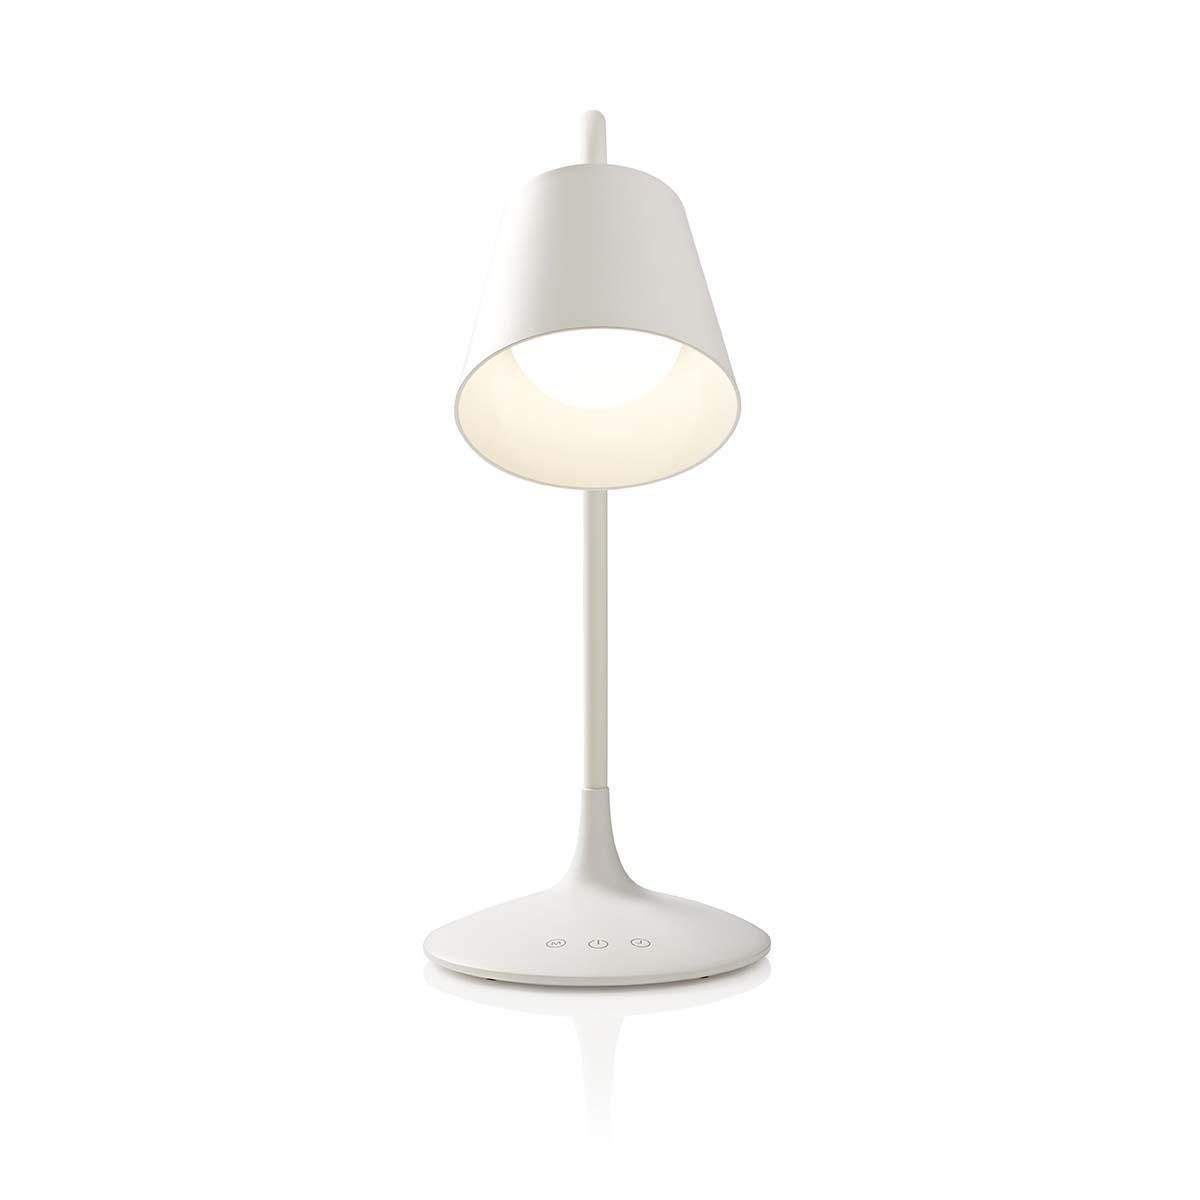 Dimbare LED tafellamp   Aanraakbediening   3 lichtmodi   Oplaadbare batterij   150 lm